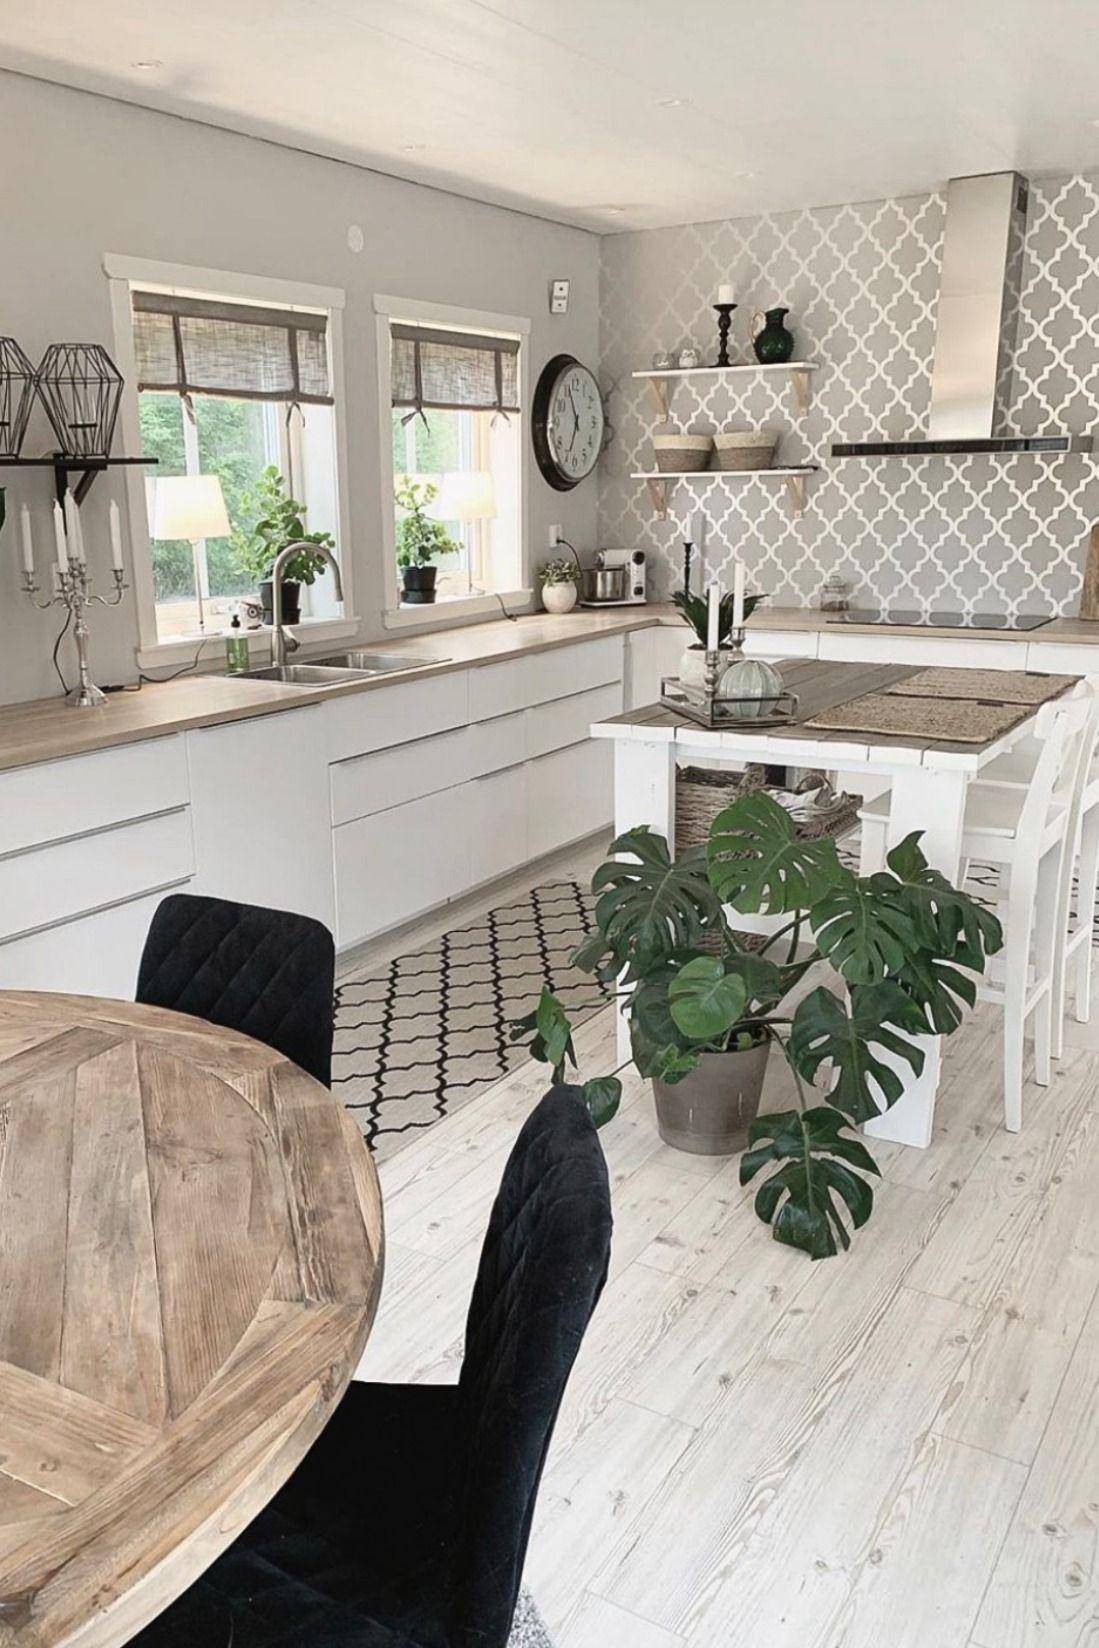 Henderson Interiors Camden Trellis Wallpaper in Soft Grey & Silver ...